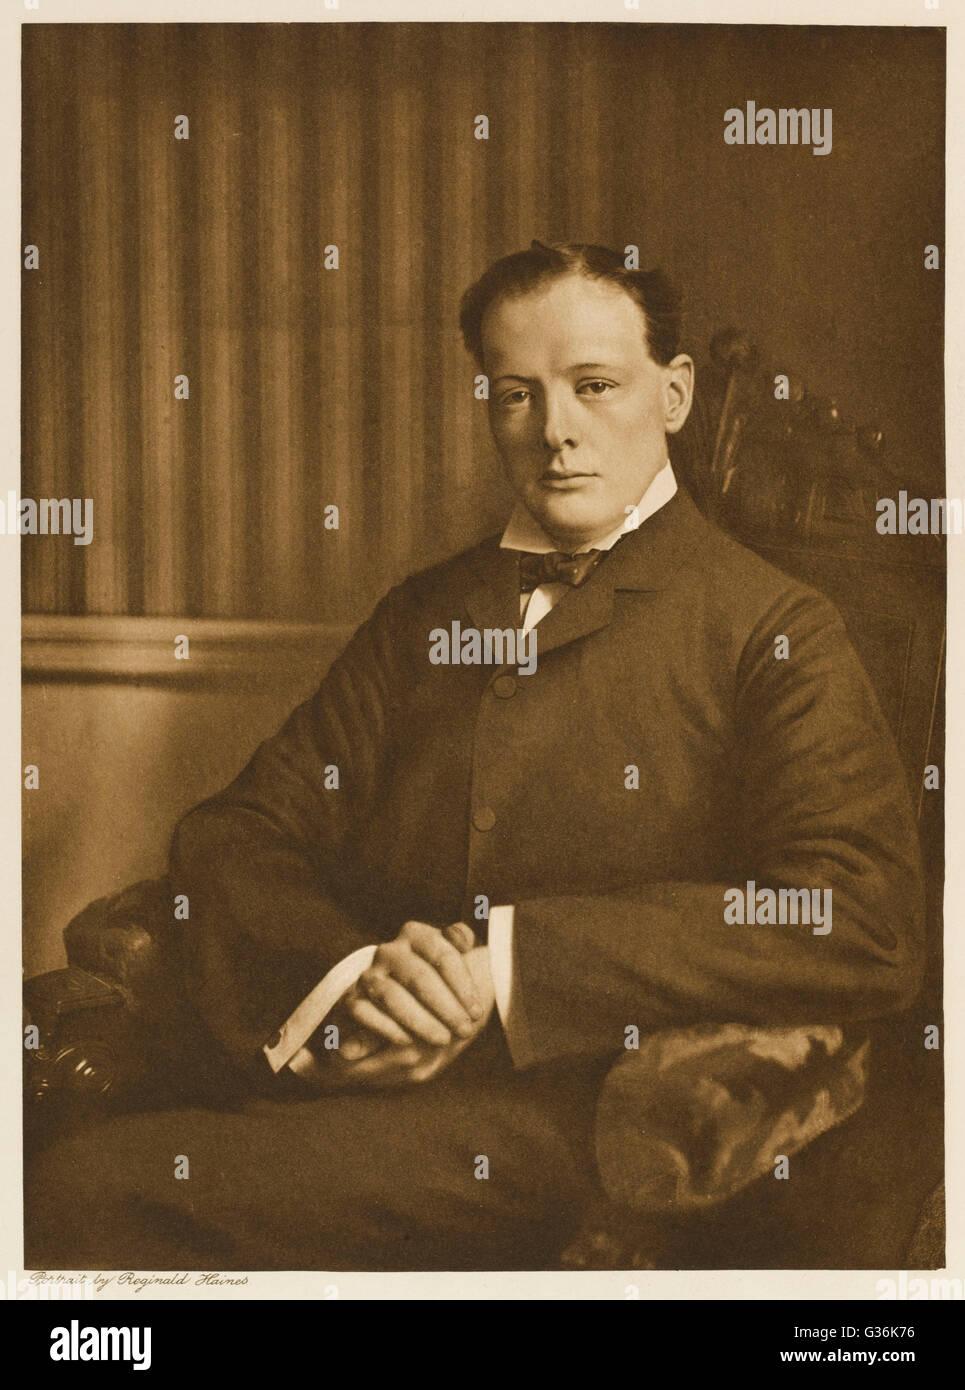 Winston Churchill (1874-1965)     Date: 1906 - Stock Image